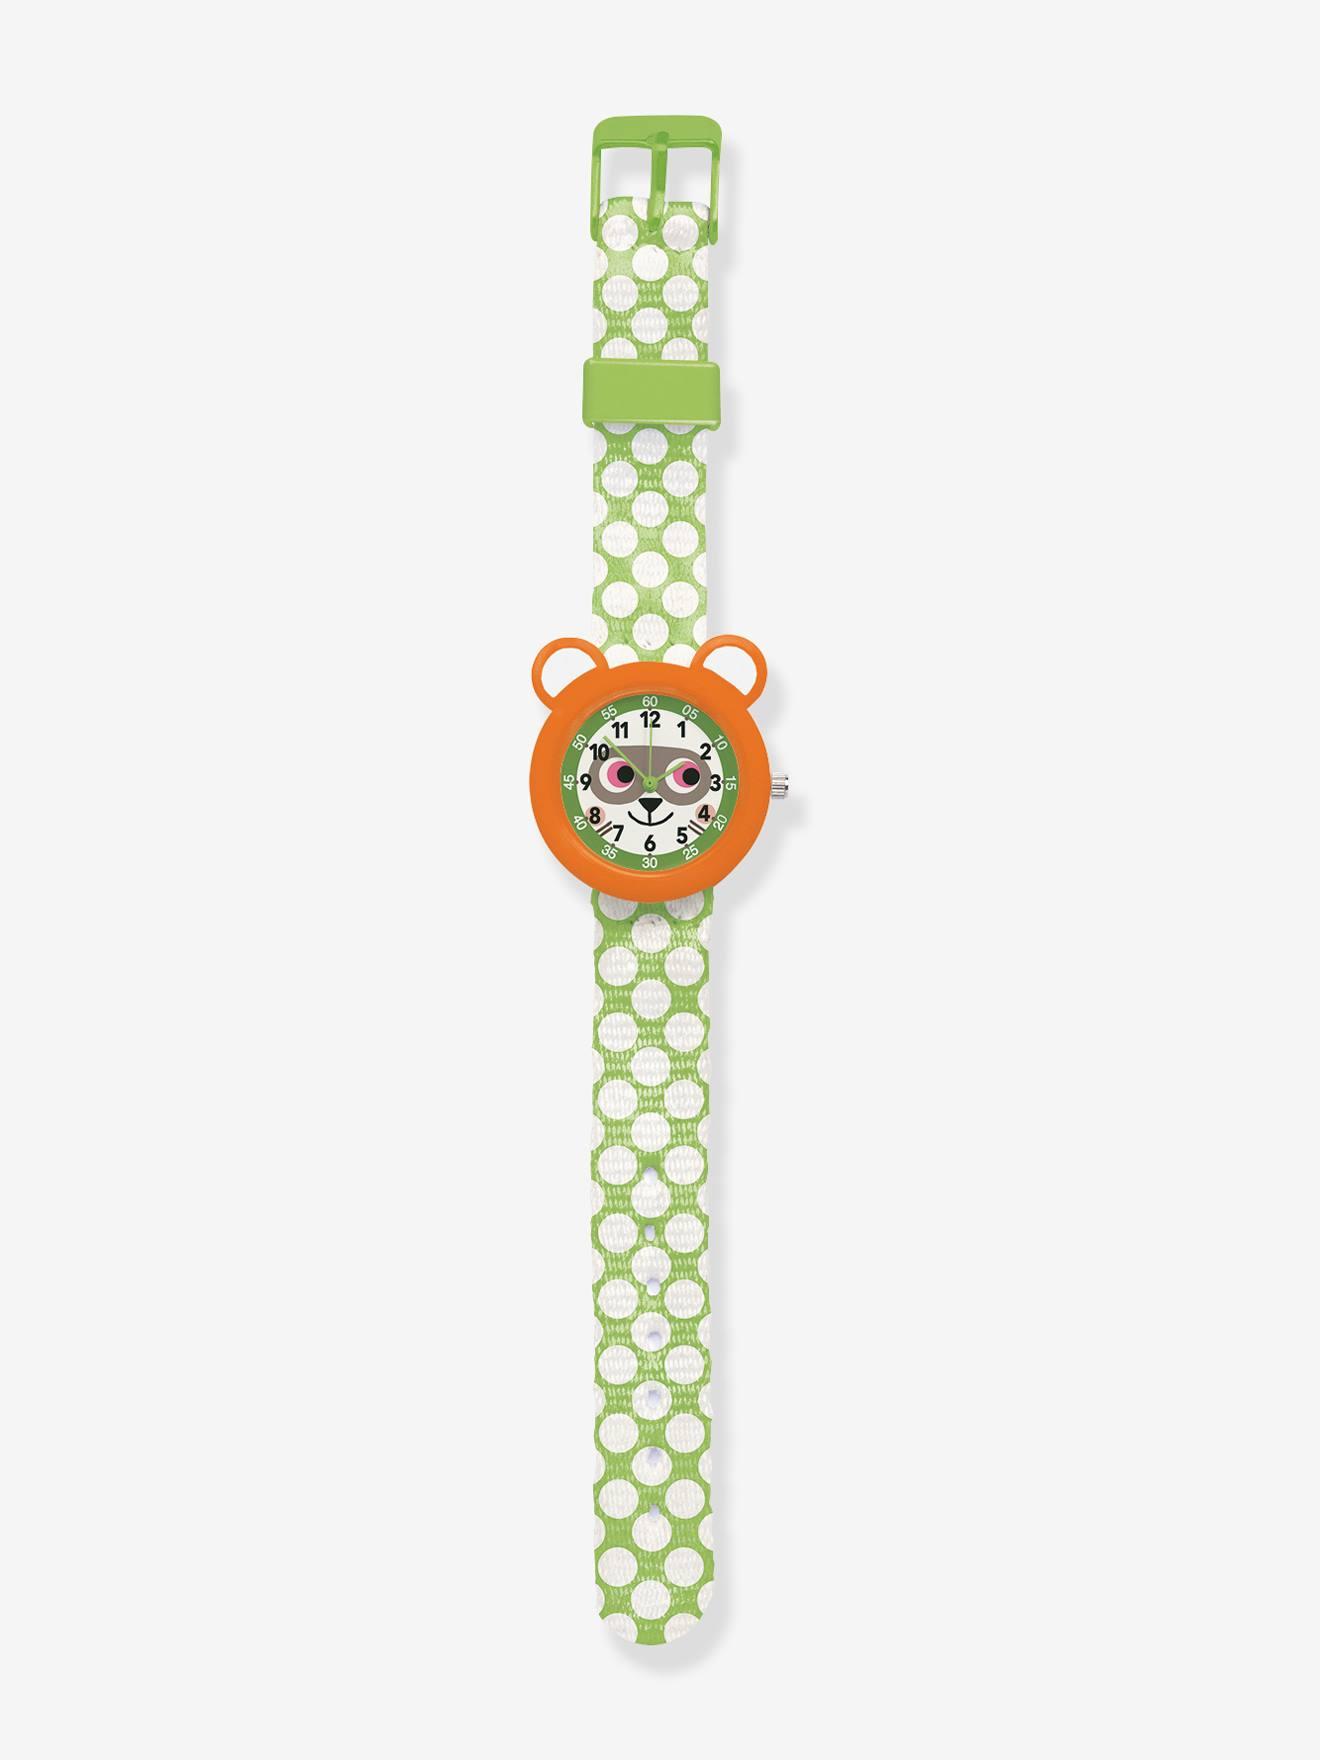 Relógio para menino, da DJECO laranja medio liso com motivo